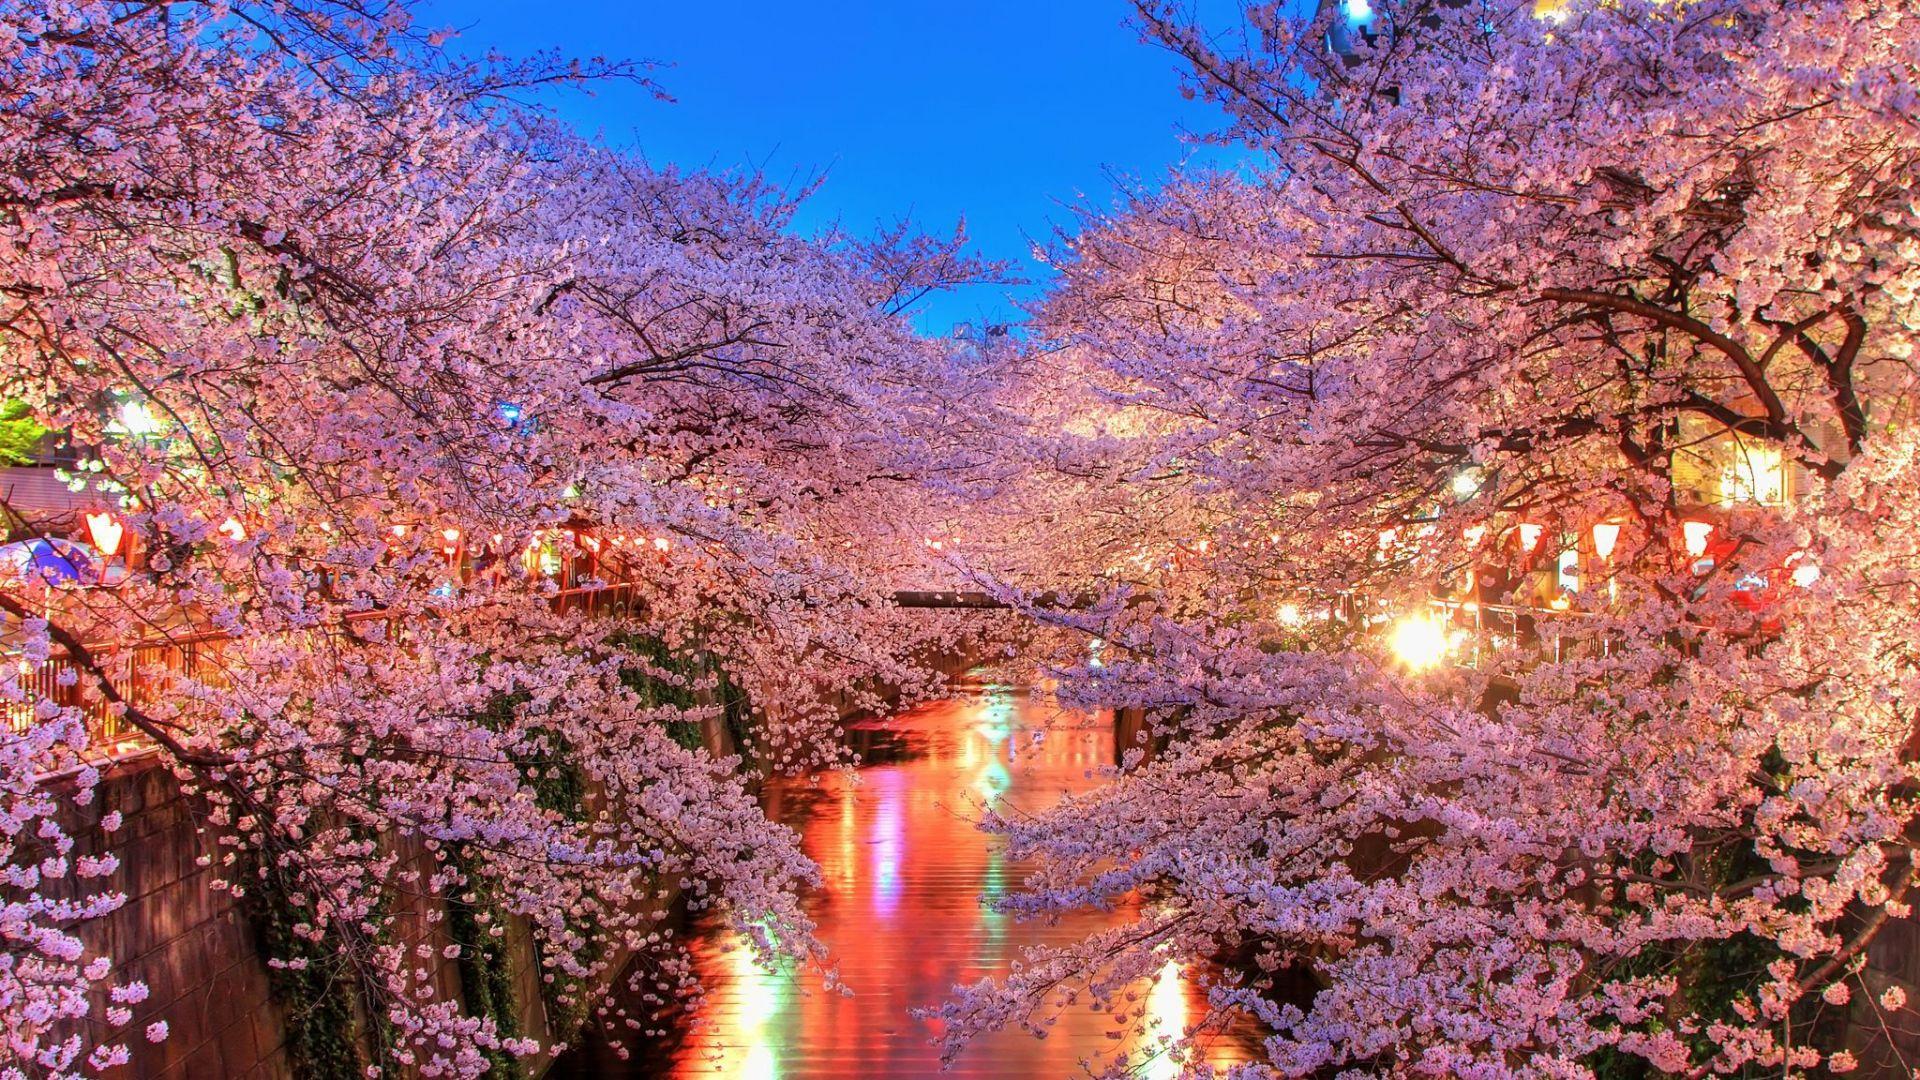 1920x1080 Wallpaper O Hanami Blossom Sakura Japan Bunga Sakura Gambar Bunga Sakura